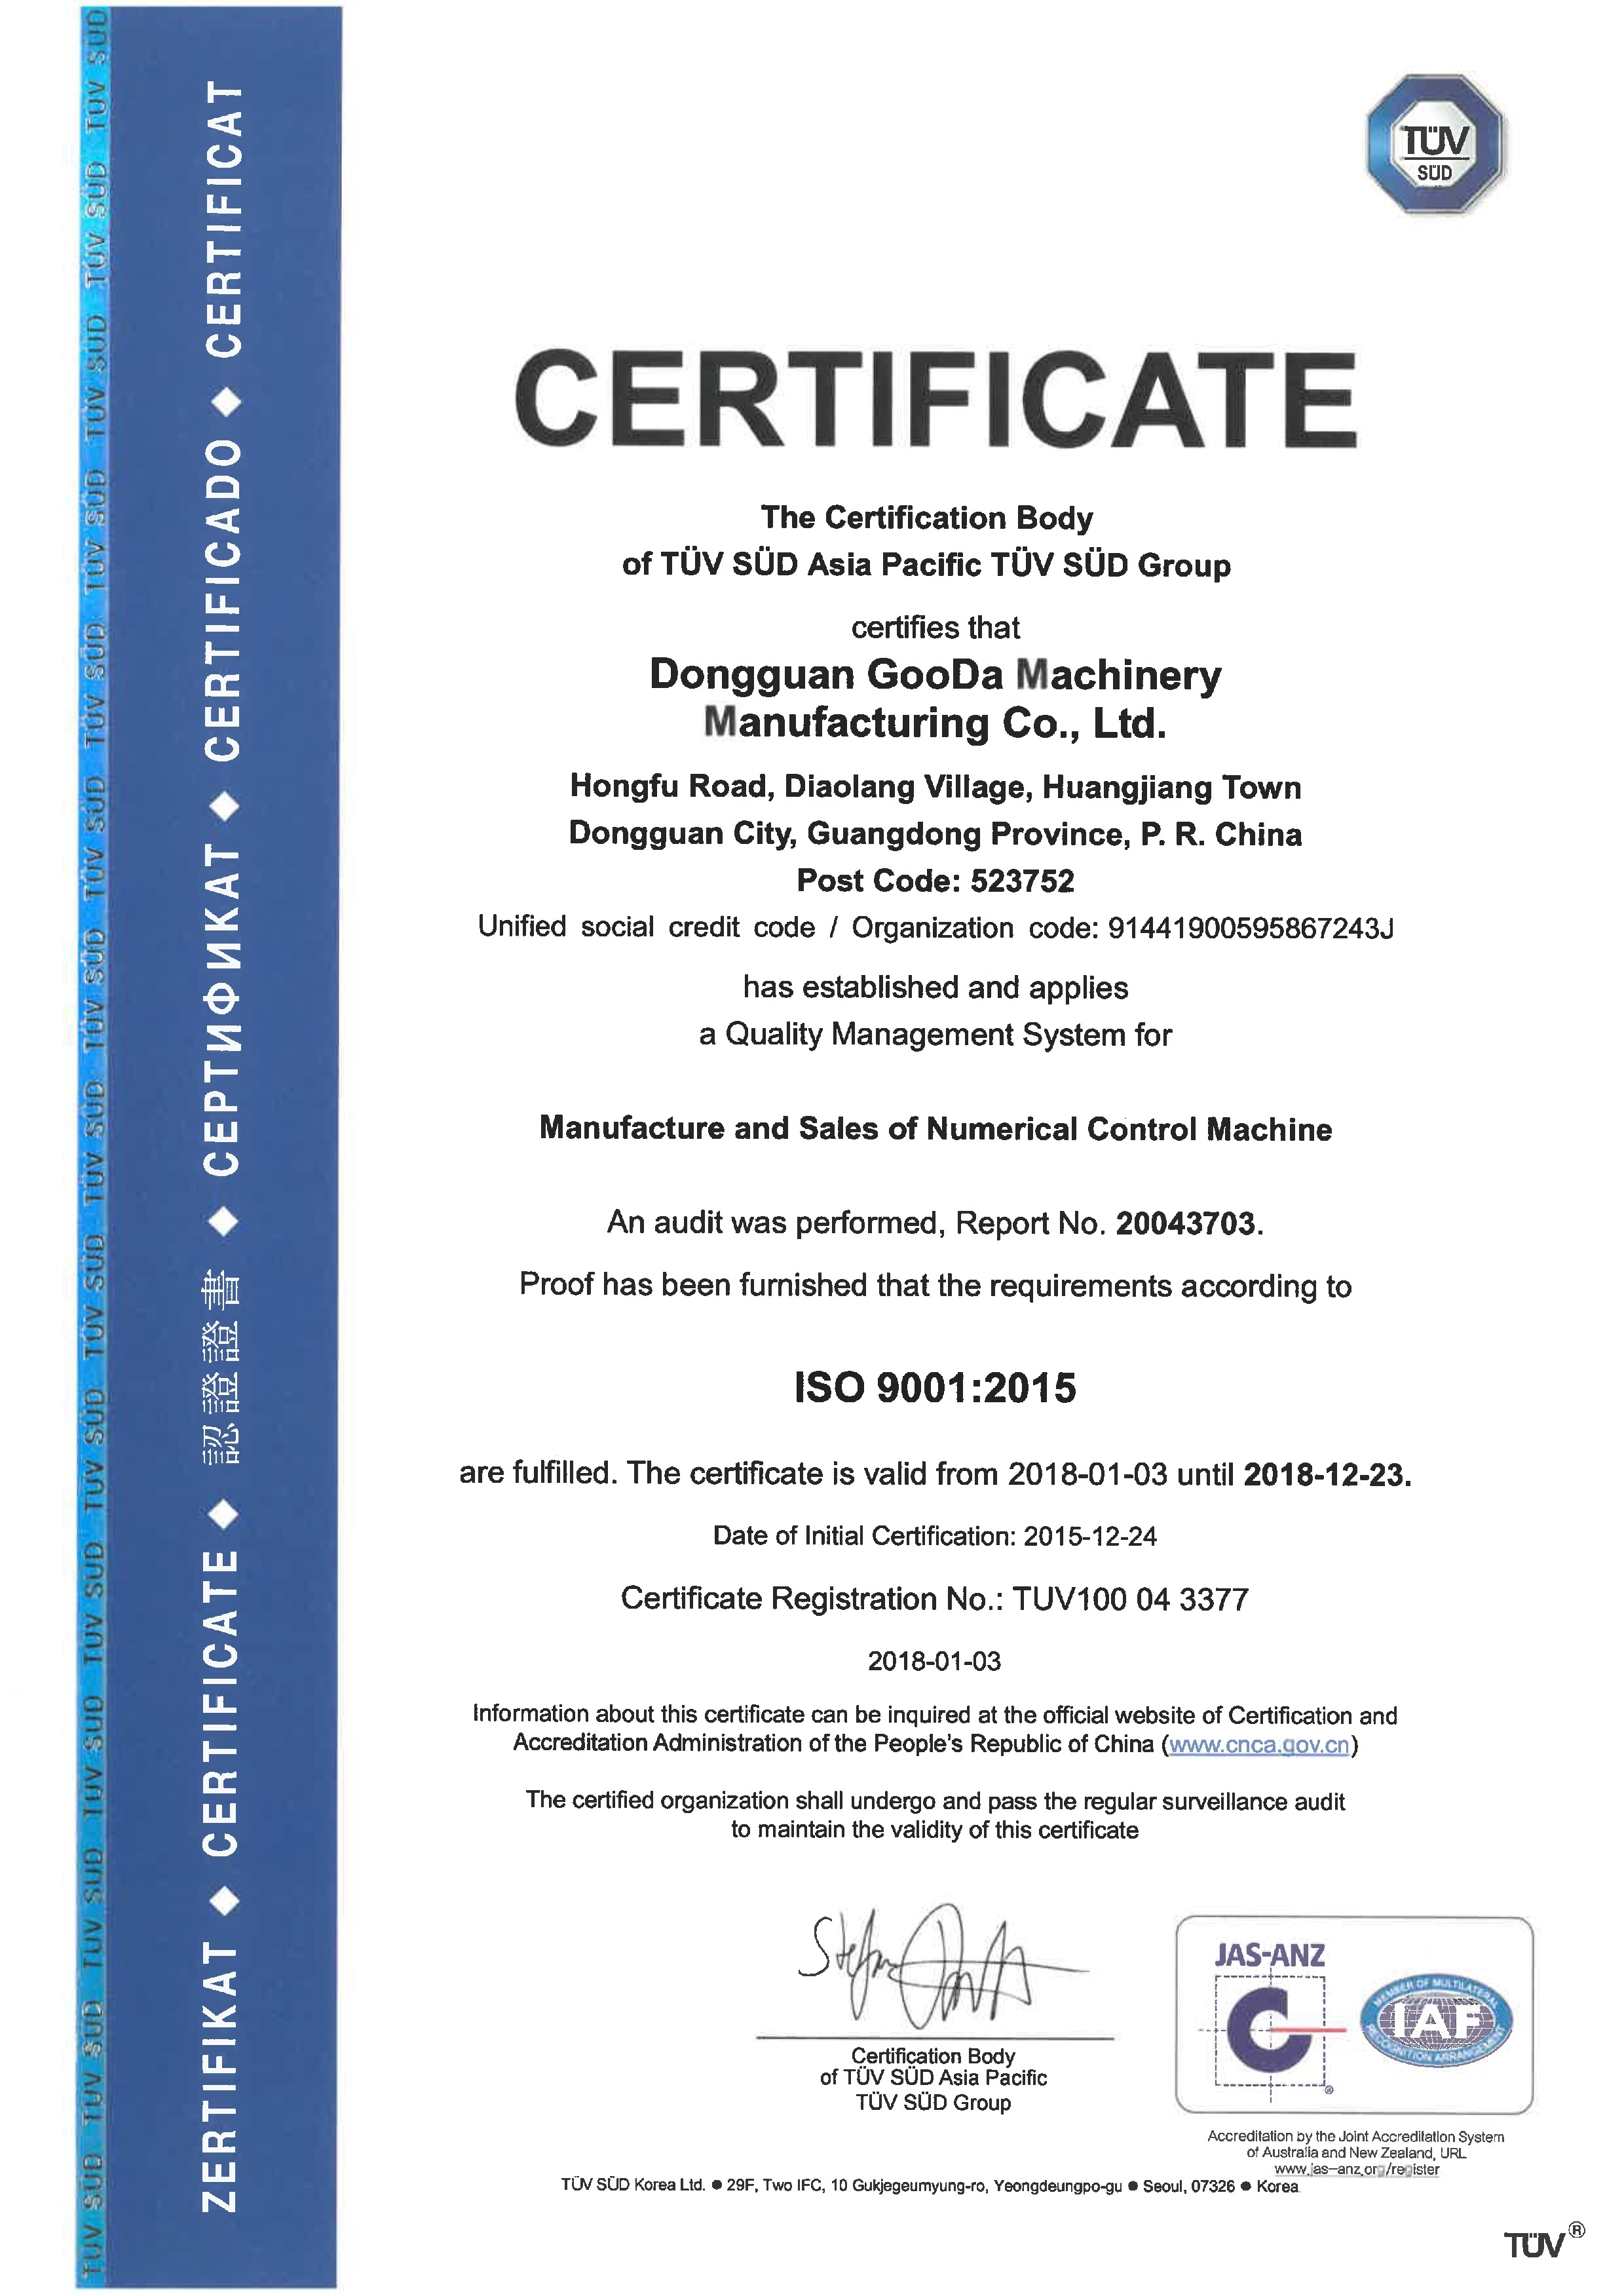 Quality Management Duplex Milling Machine Certificate Gooda Cnc